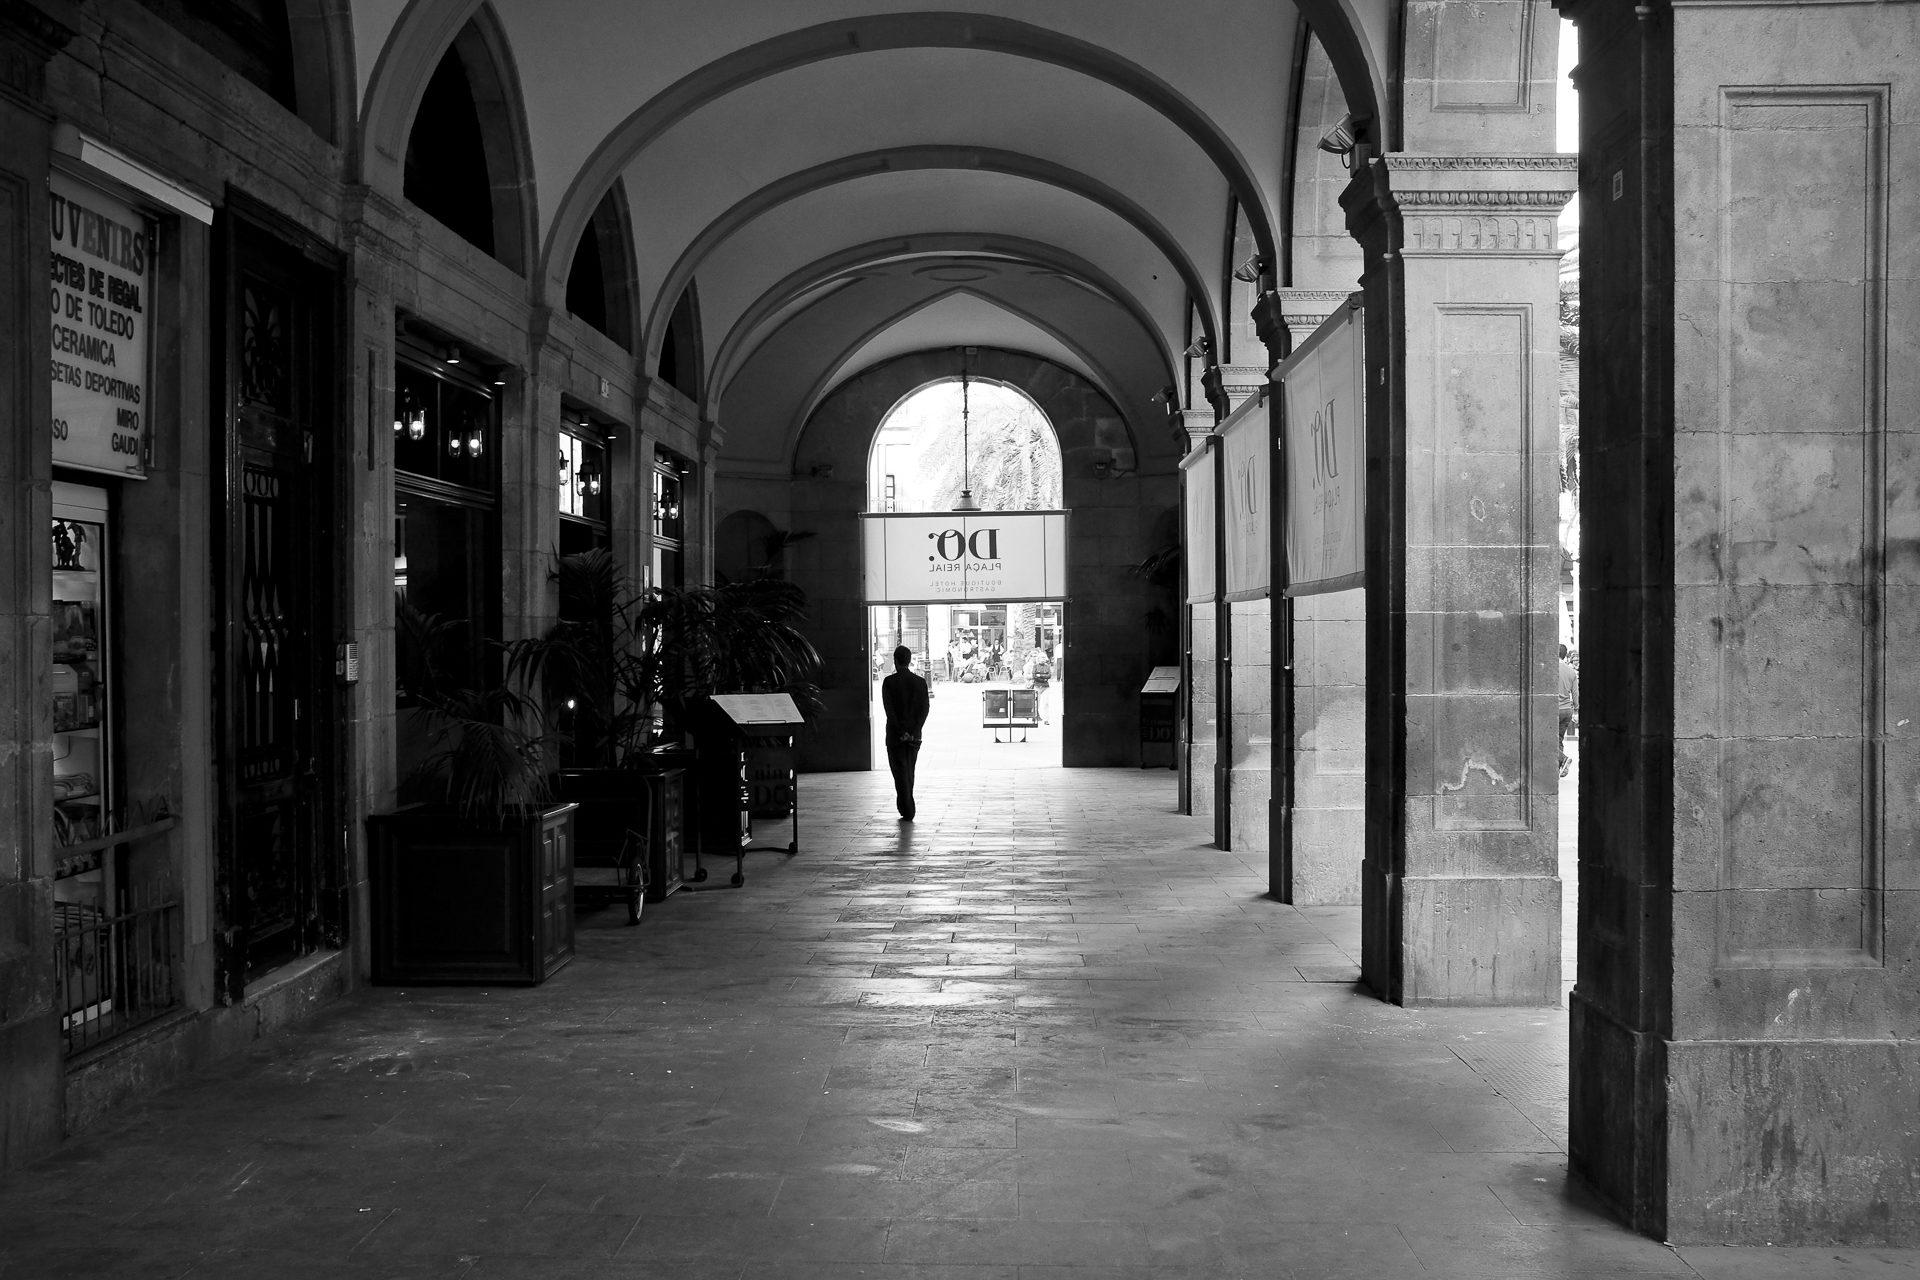 barcelona_19_03_copyright_thomas_schmidt_113